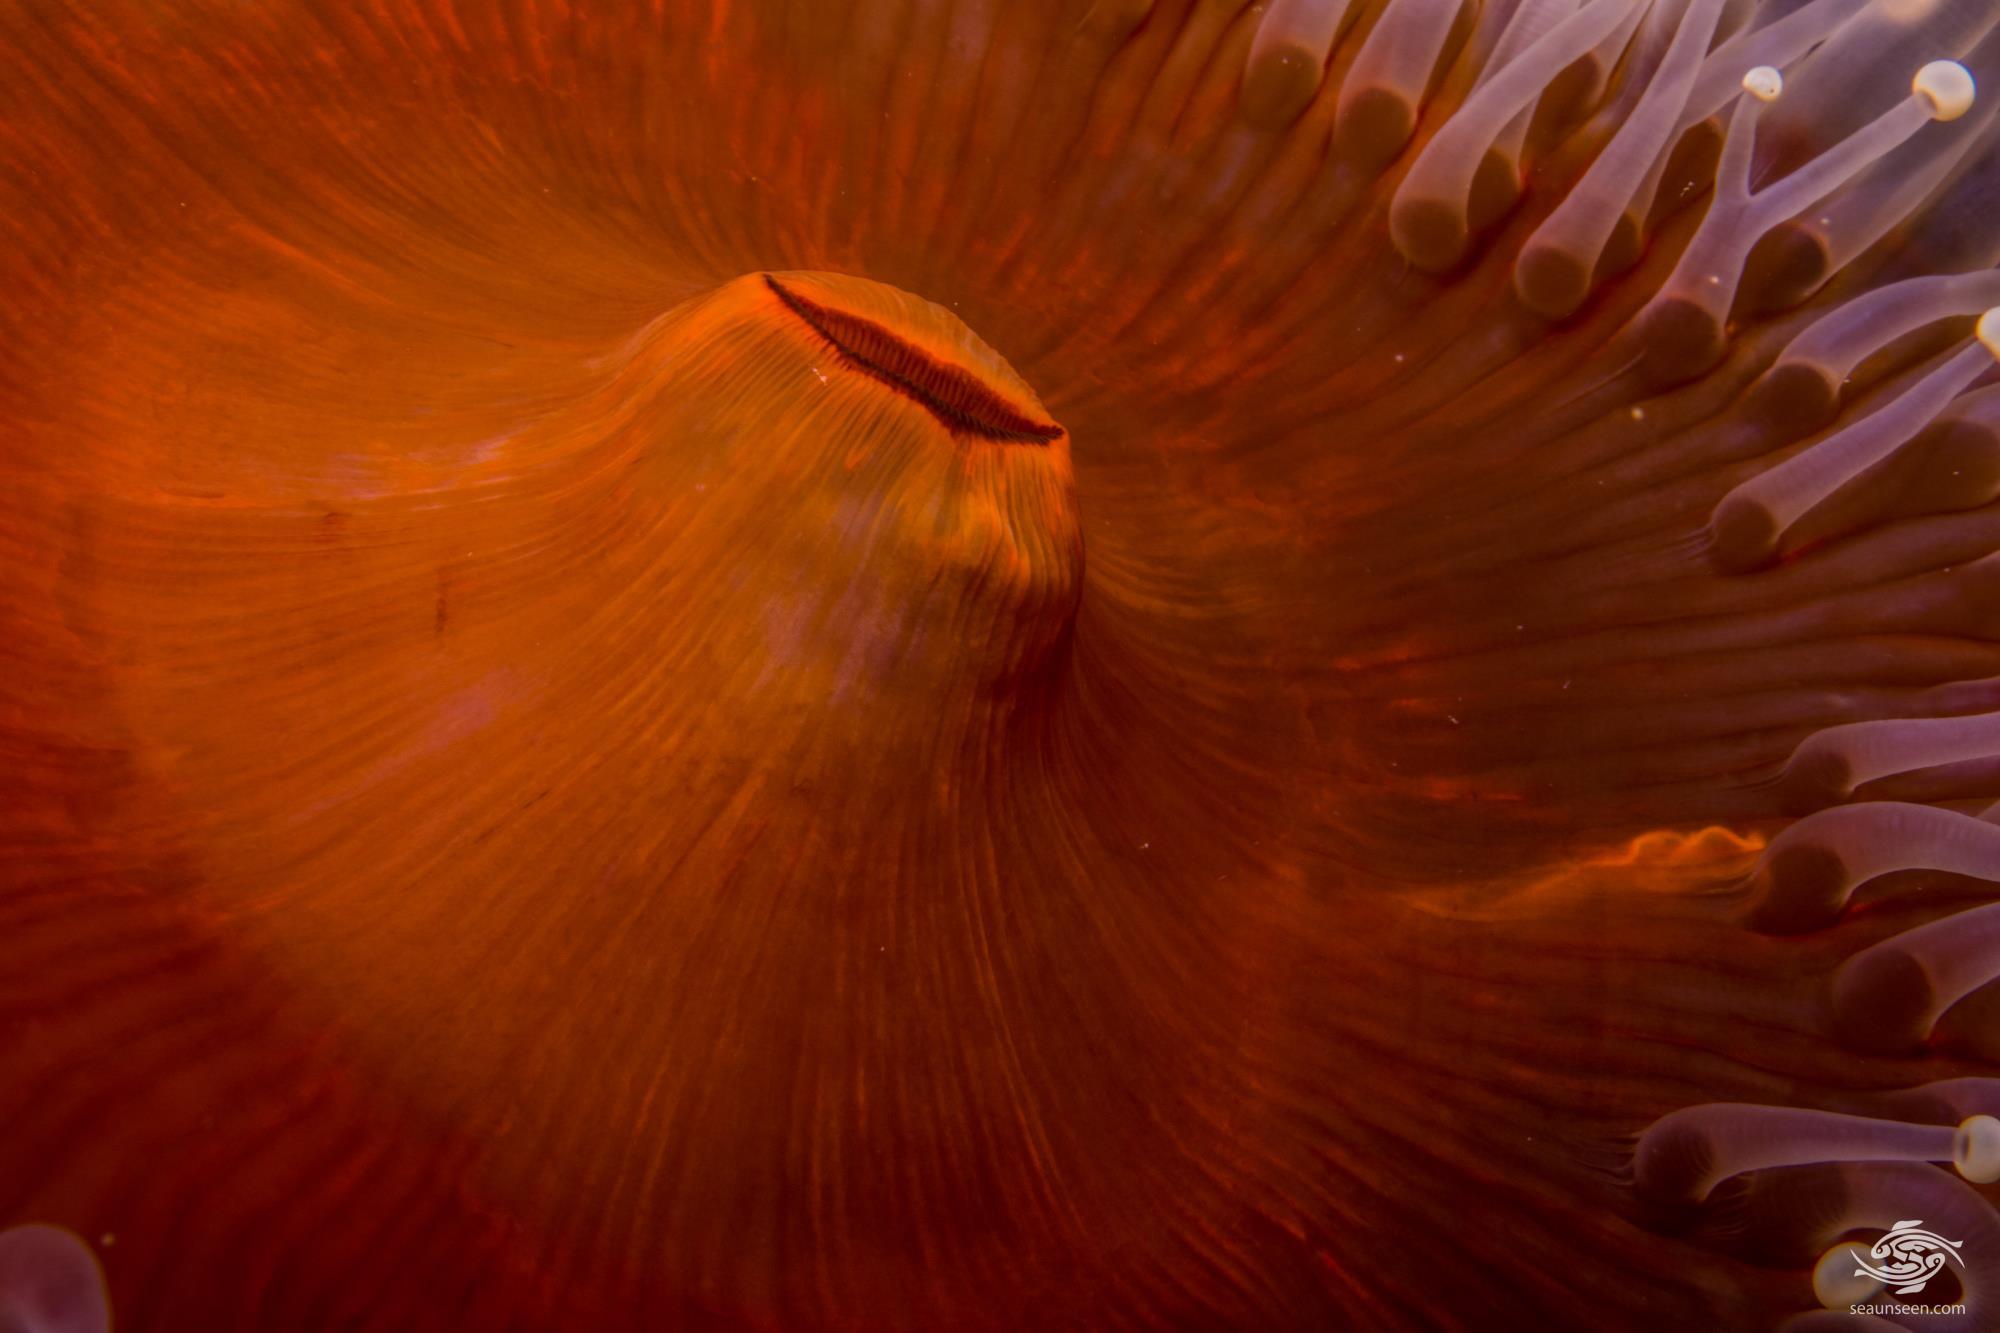 Giant Reef Corallimorph (Paracorynactis hoplites)